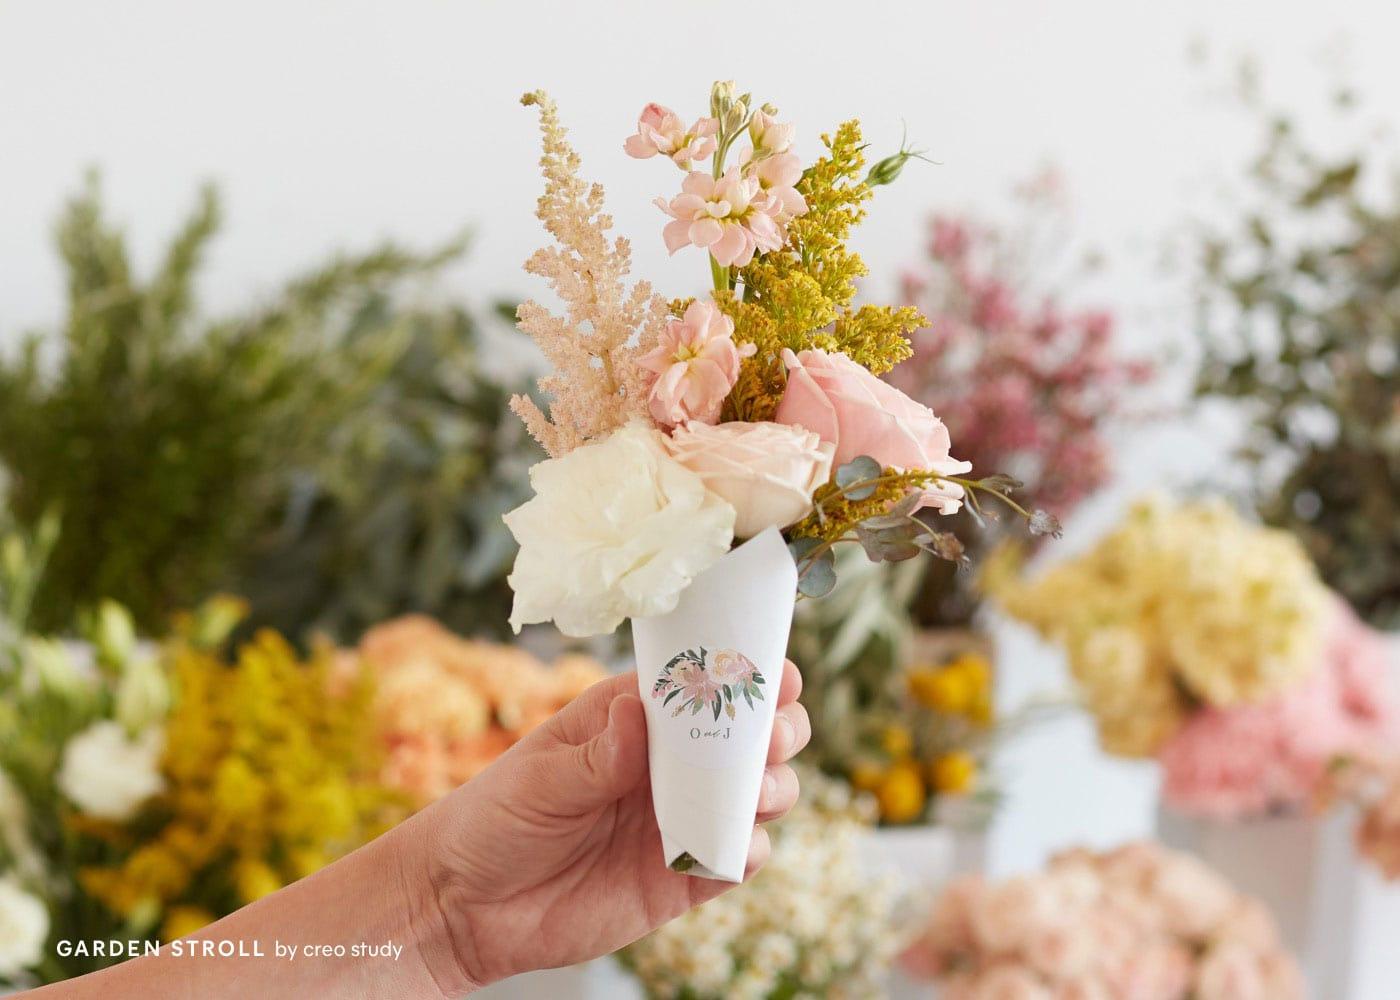 Bridal Shower Invitations - Crafty Ideas